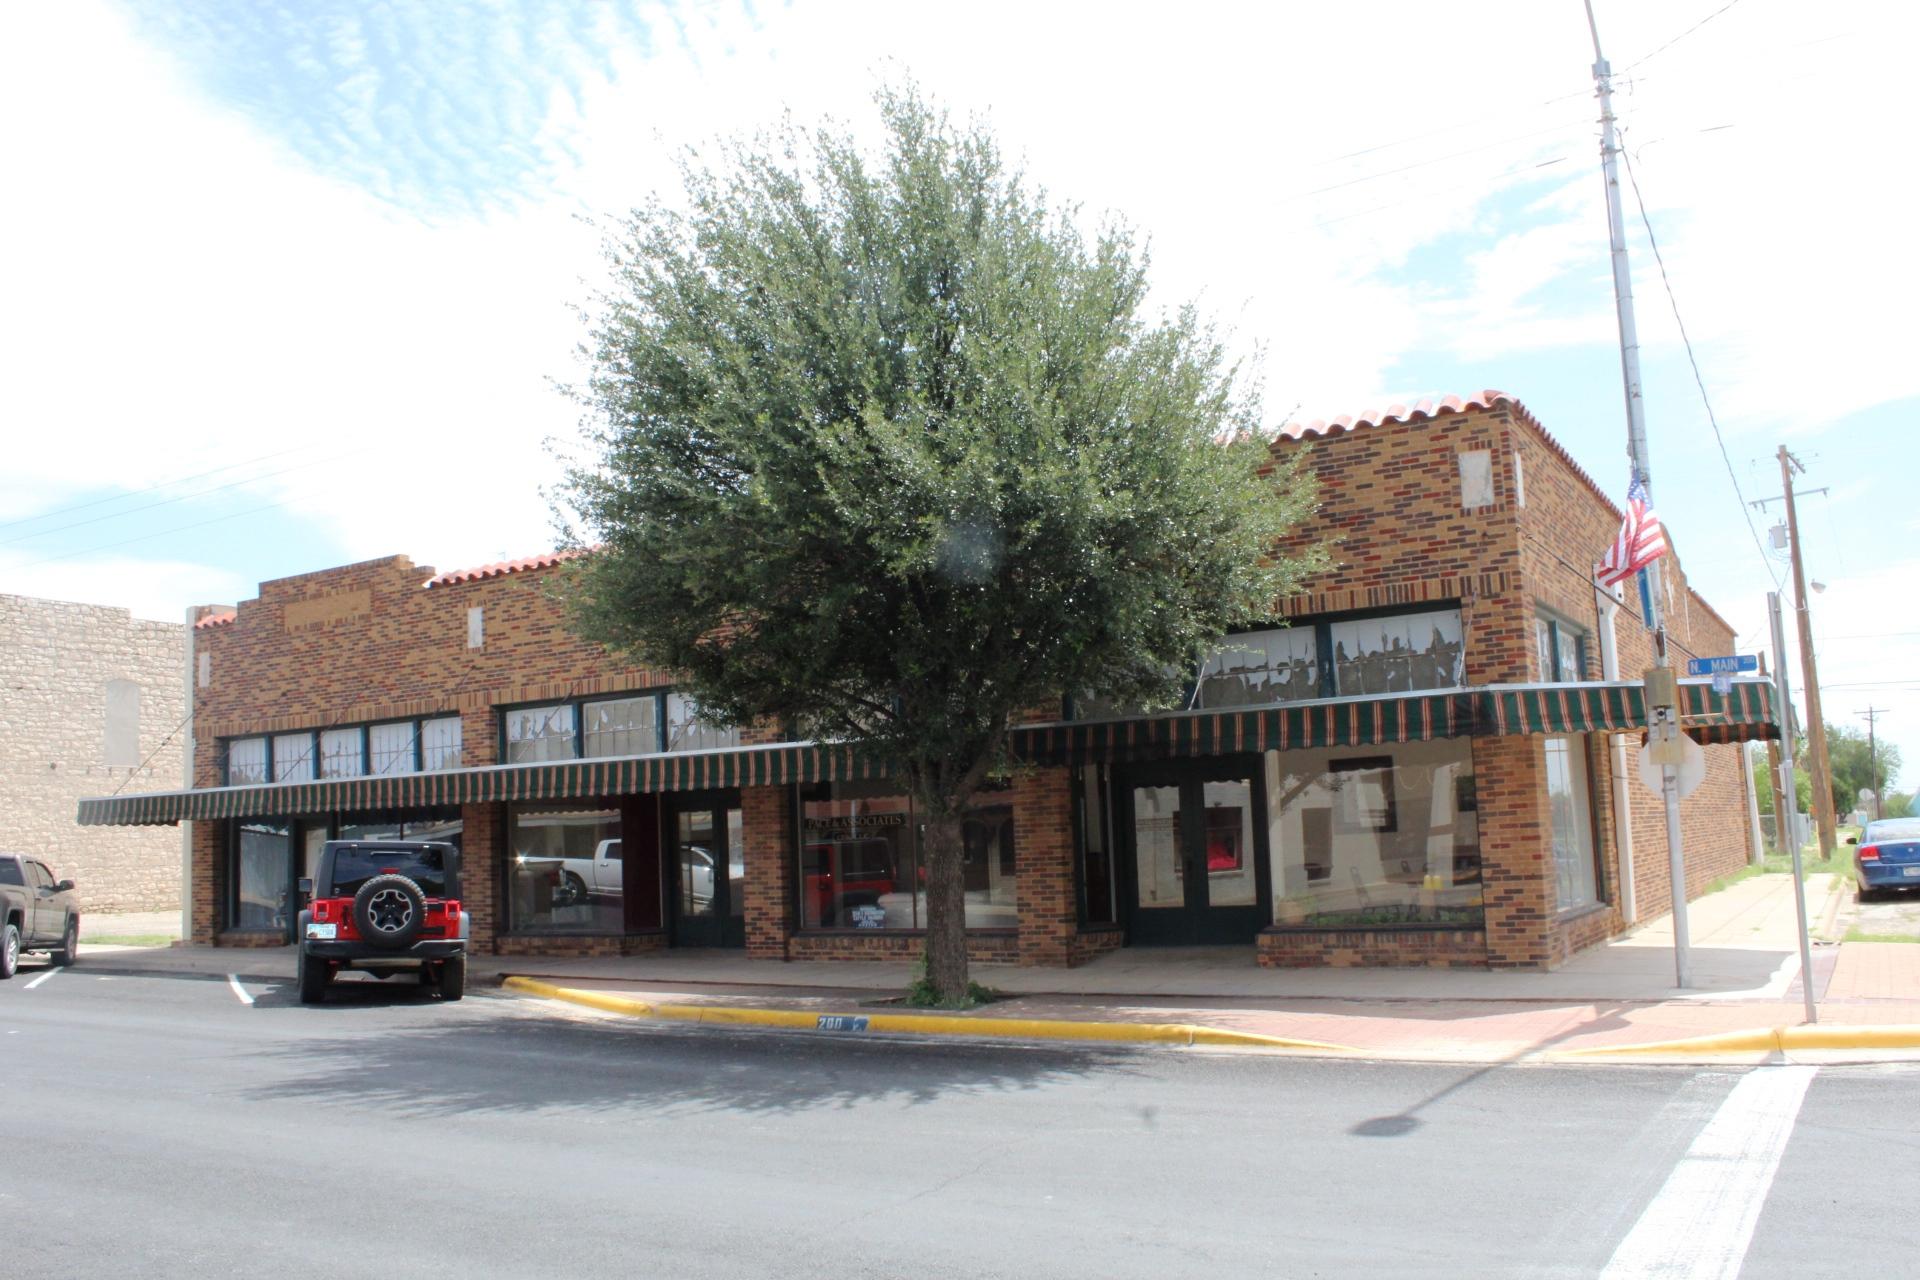 200 N Main St, Fort Stockton, TX 79735, Fort Stockton, Texas 79735